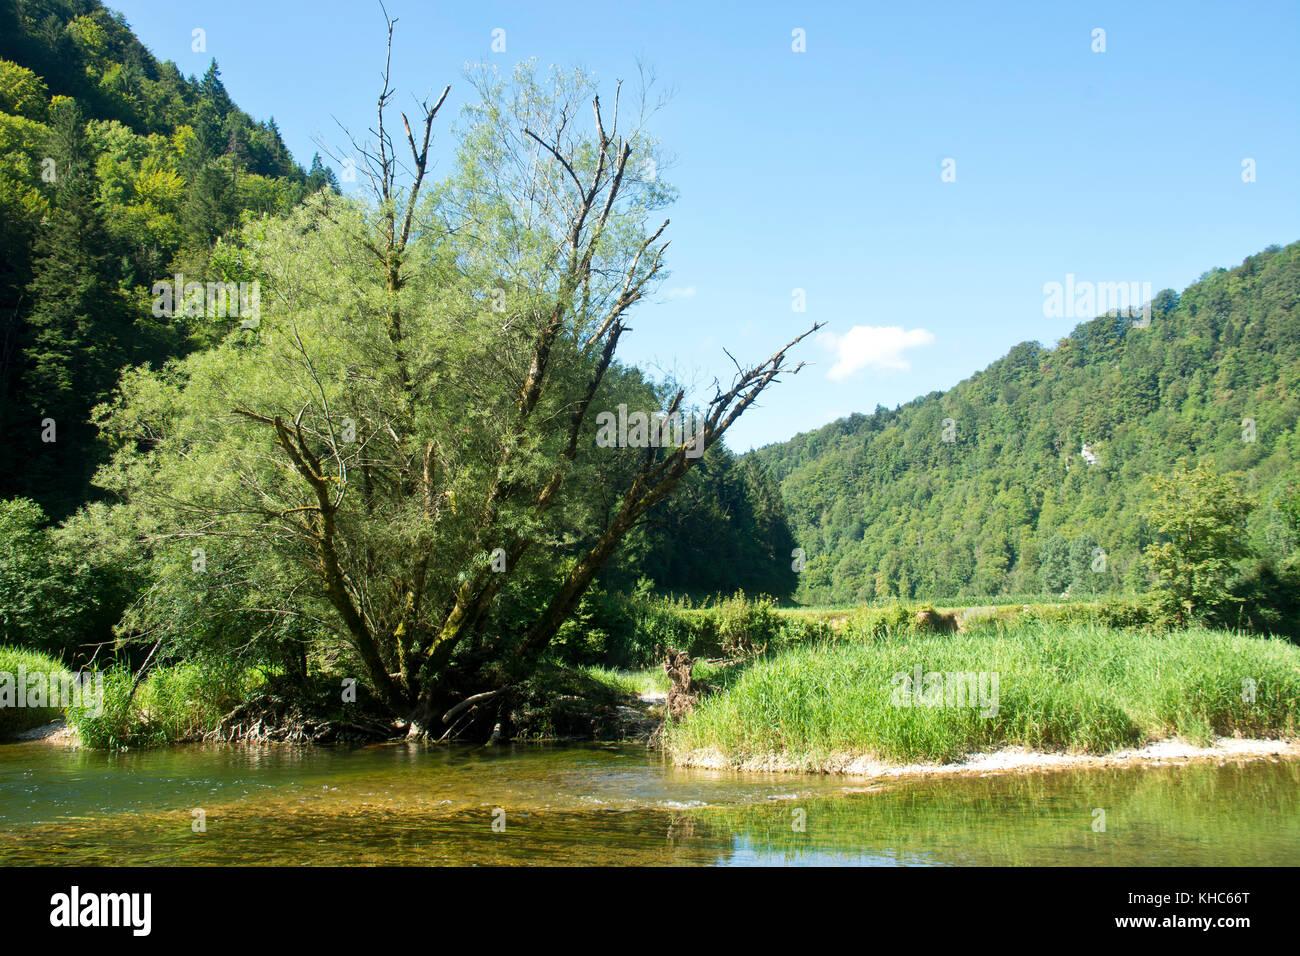 unspoilt swiss river doubs *** Local Caption *** switzerland, jura, soubey, clos du doubs, valley, doubs, river, - Stock Image